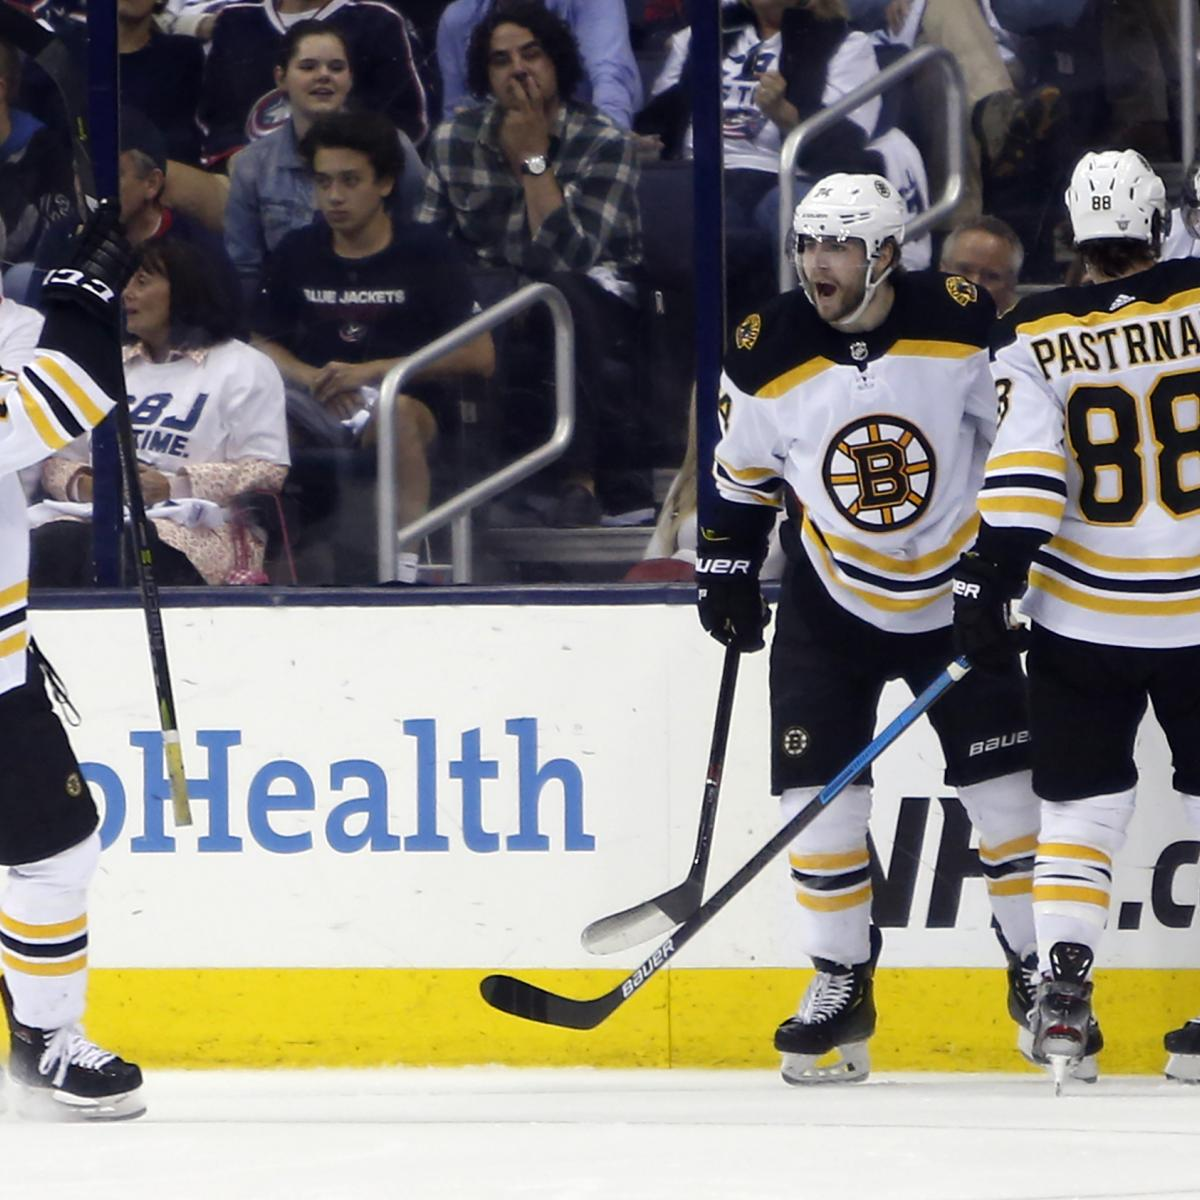 David Krejci, Bruins Eliminate Blue Jackets With 3-0 Game